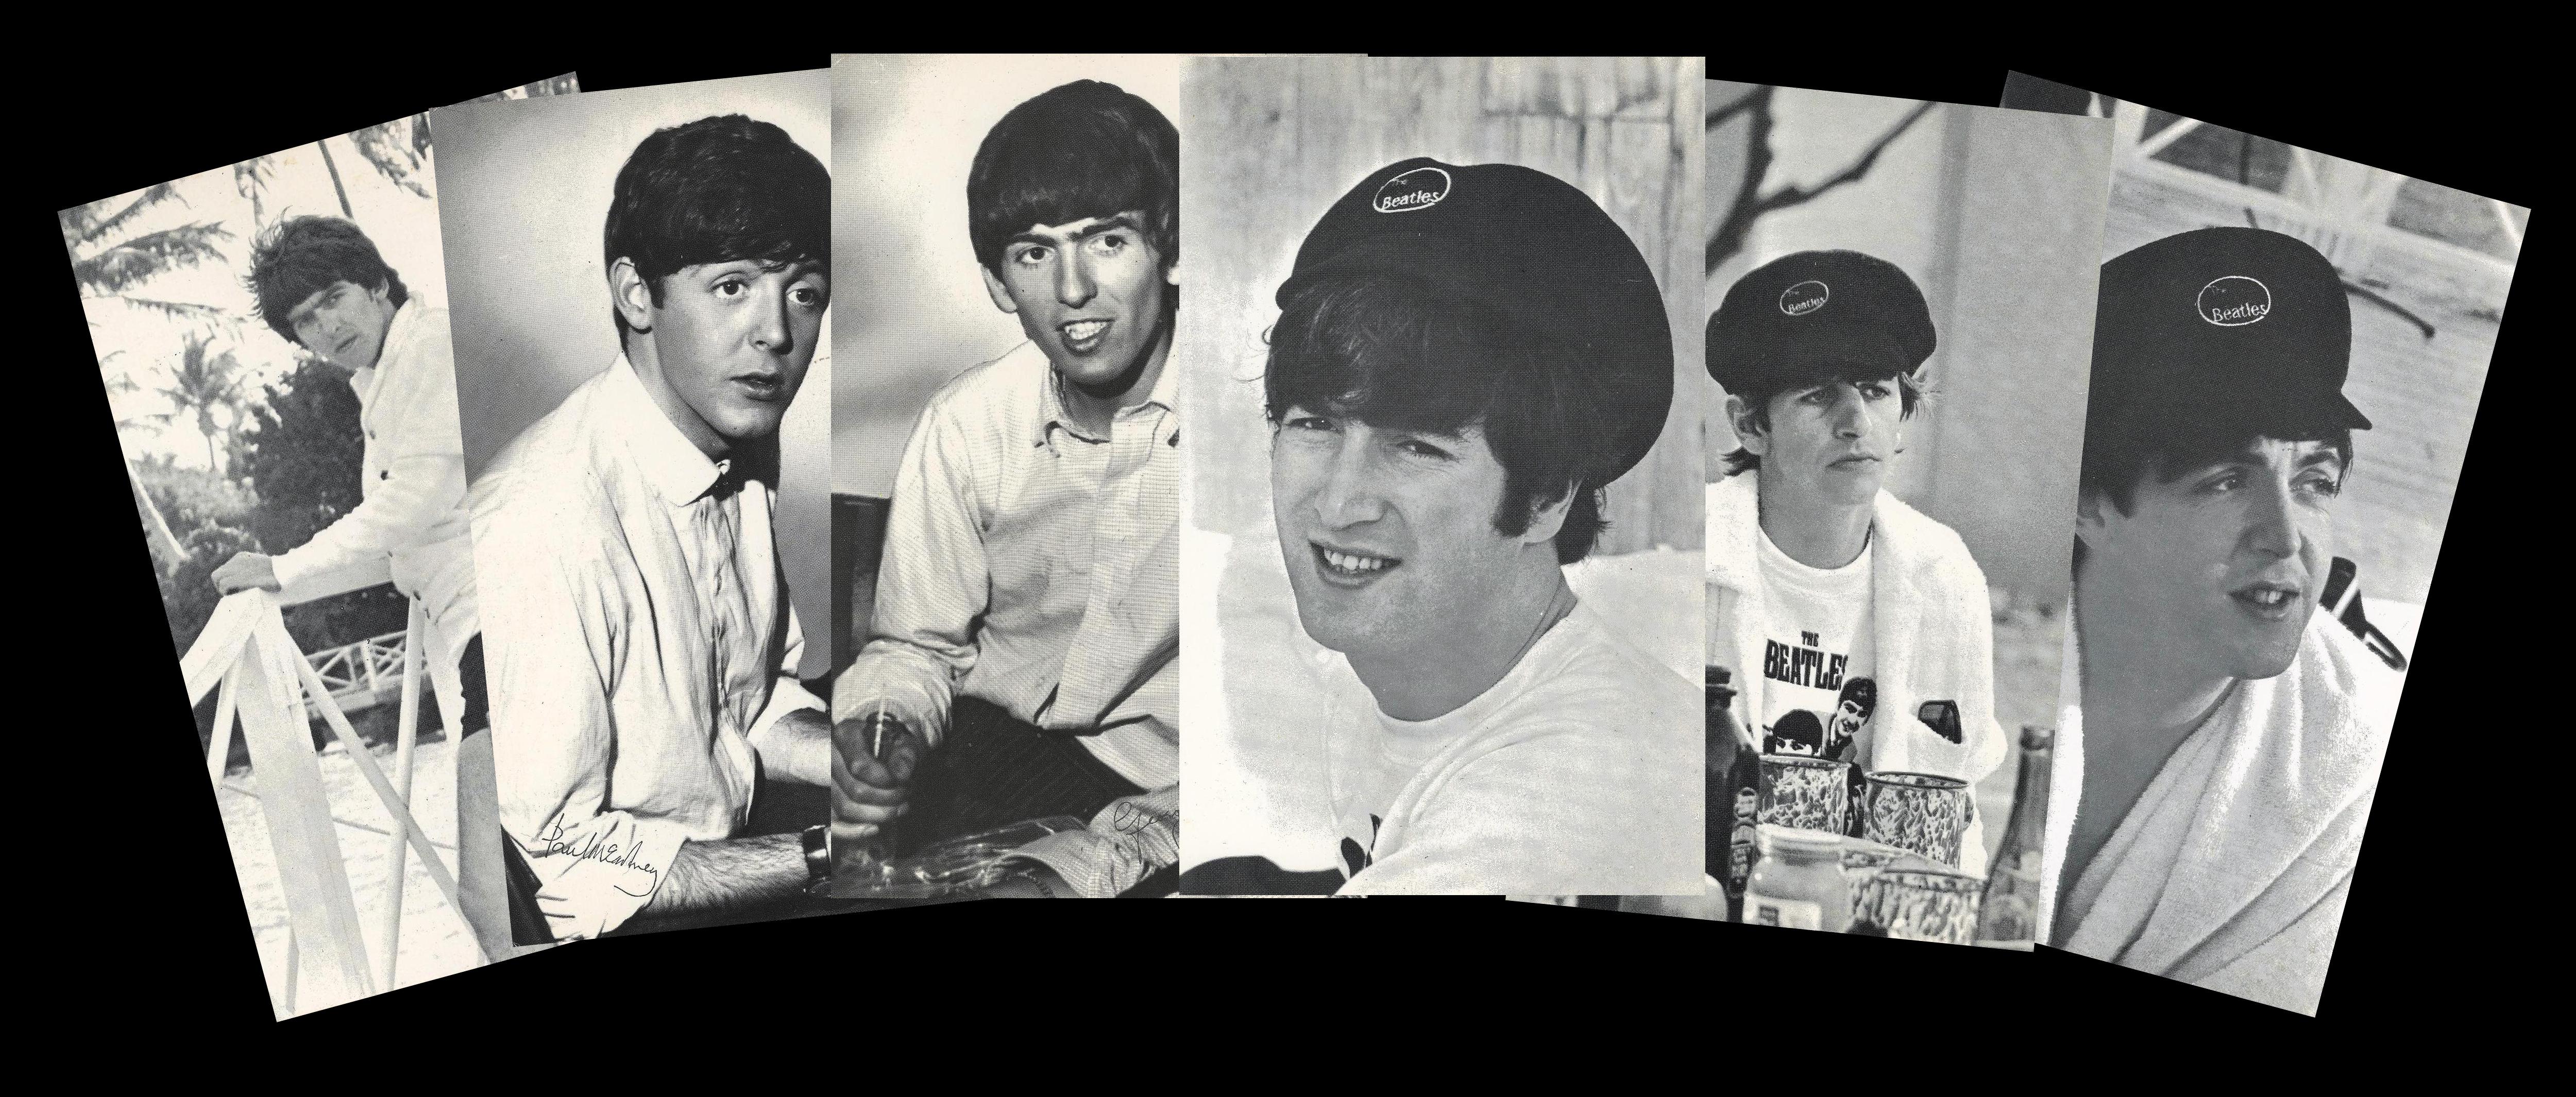 Autographs Of John Lennon Paul McCartney And George Harrison More